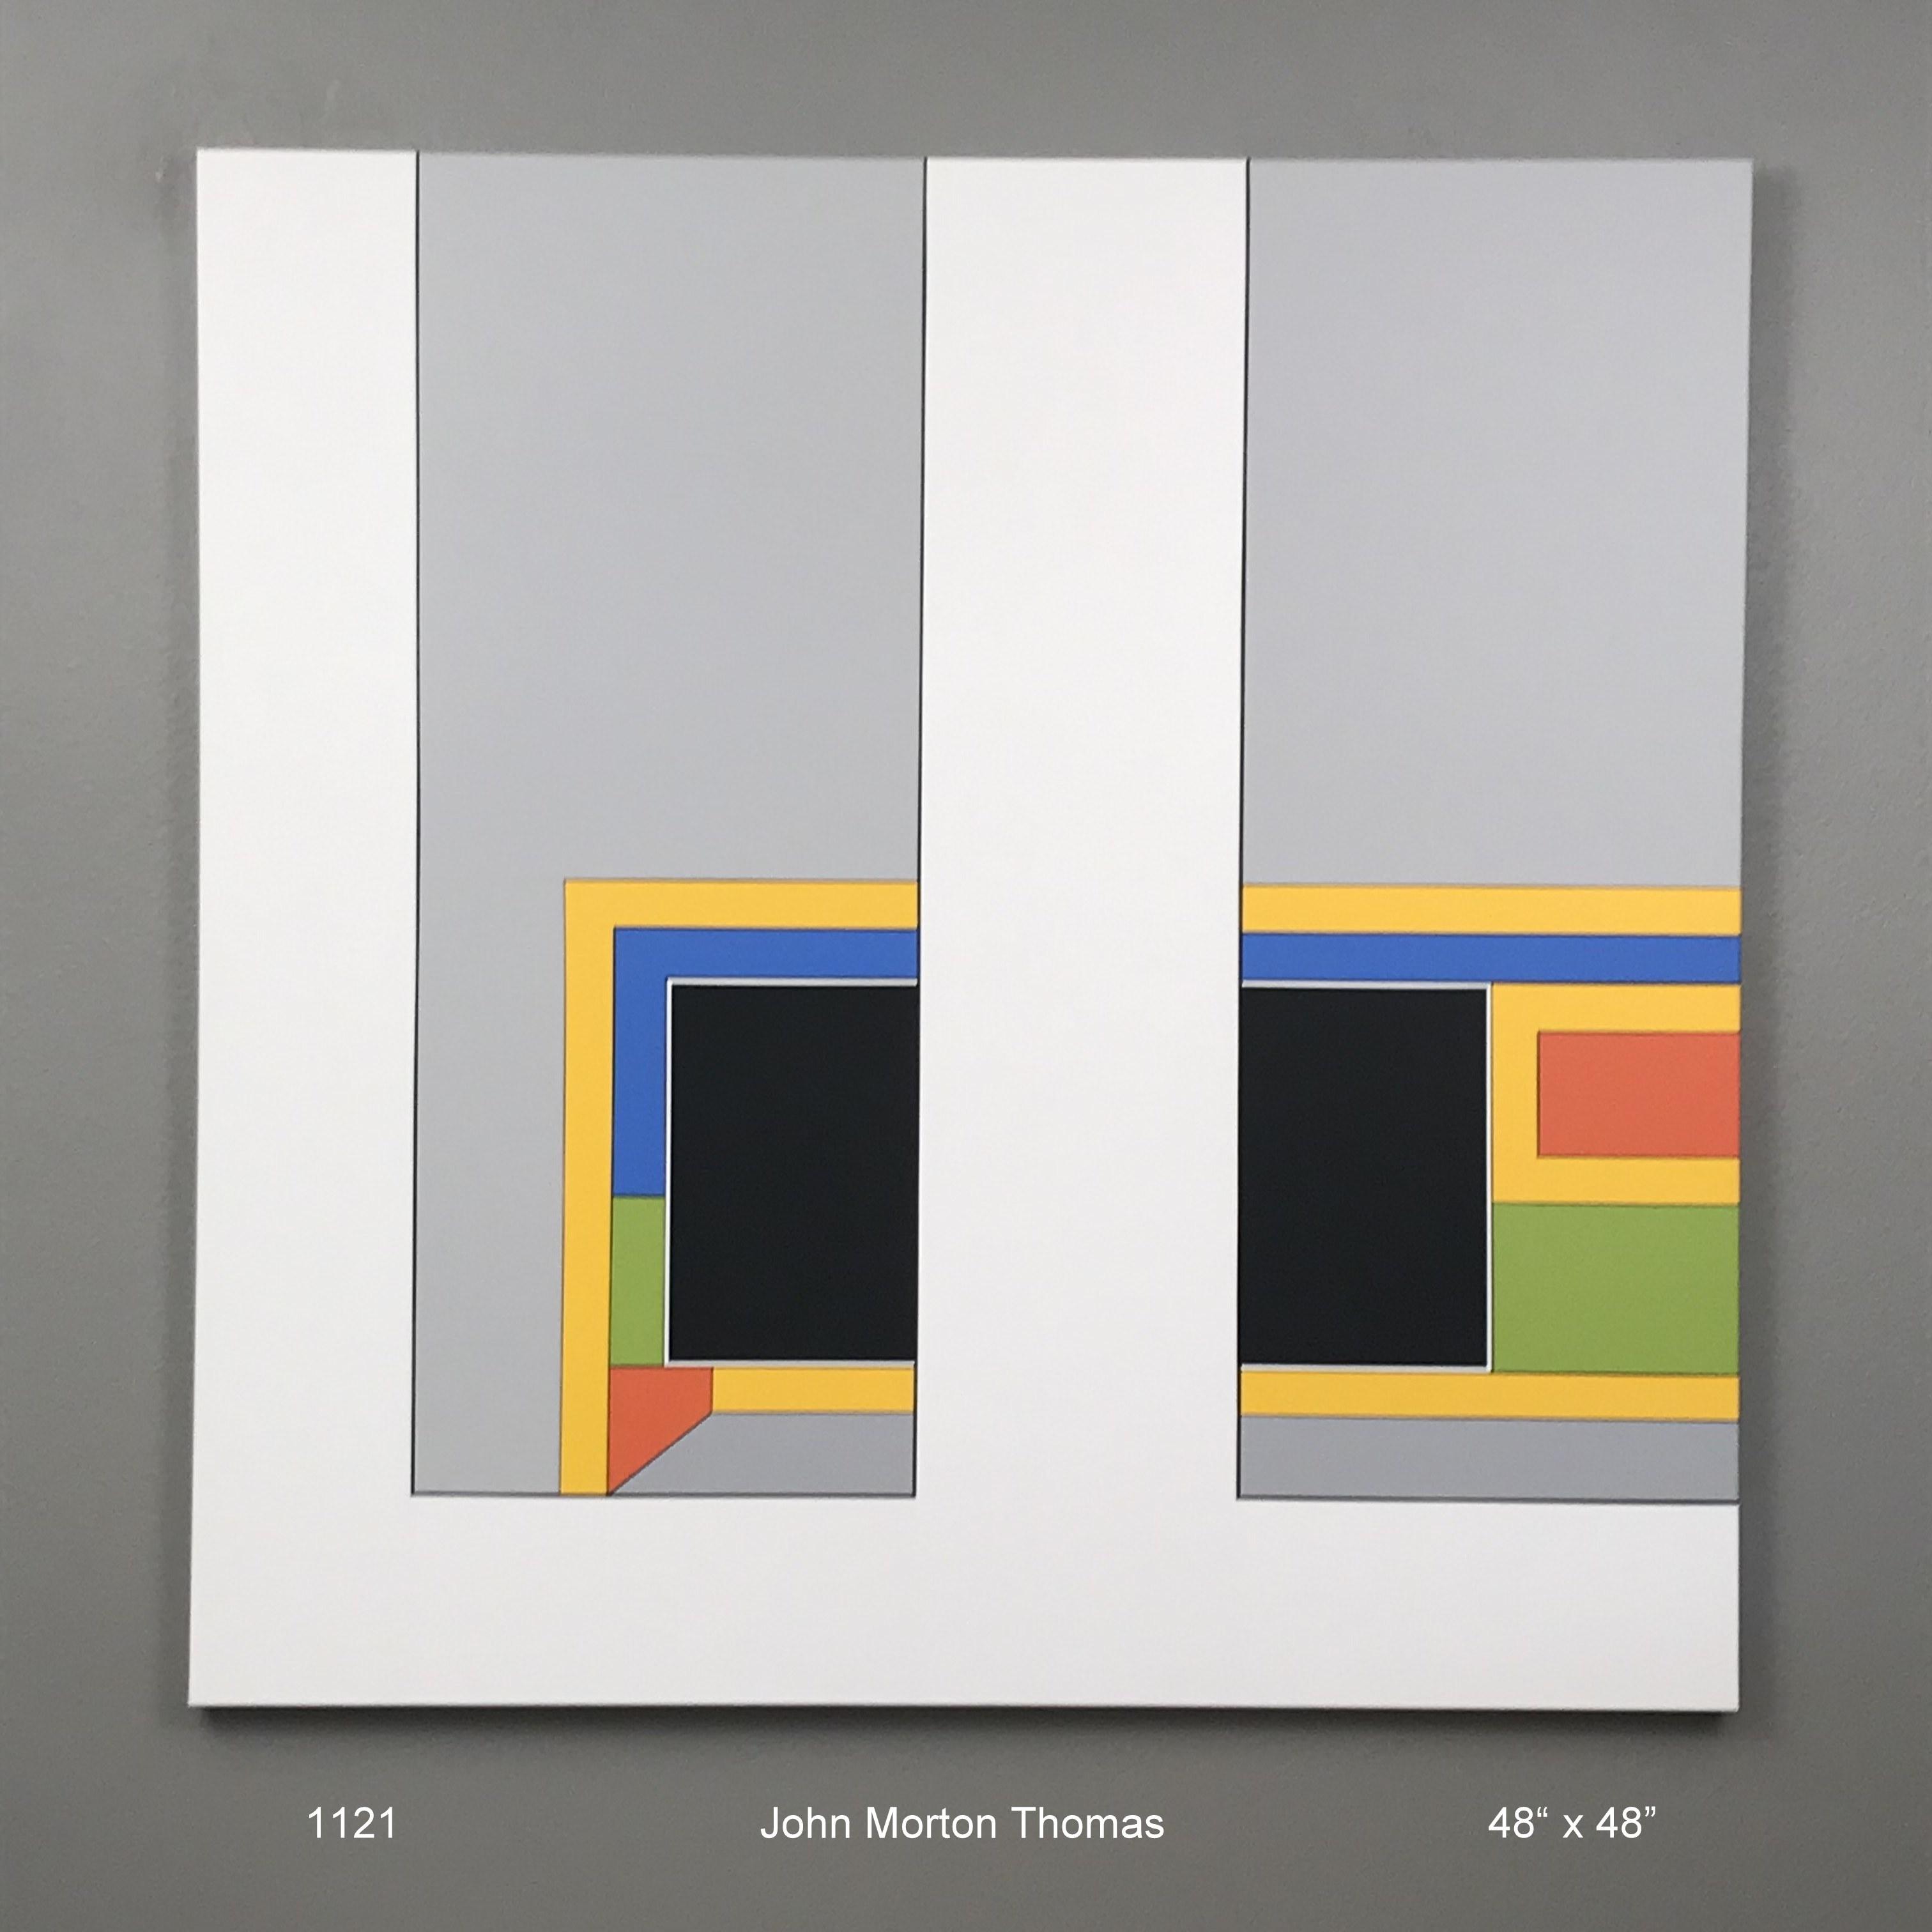 1121-JMT